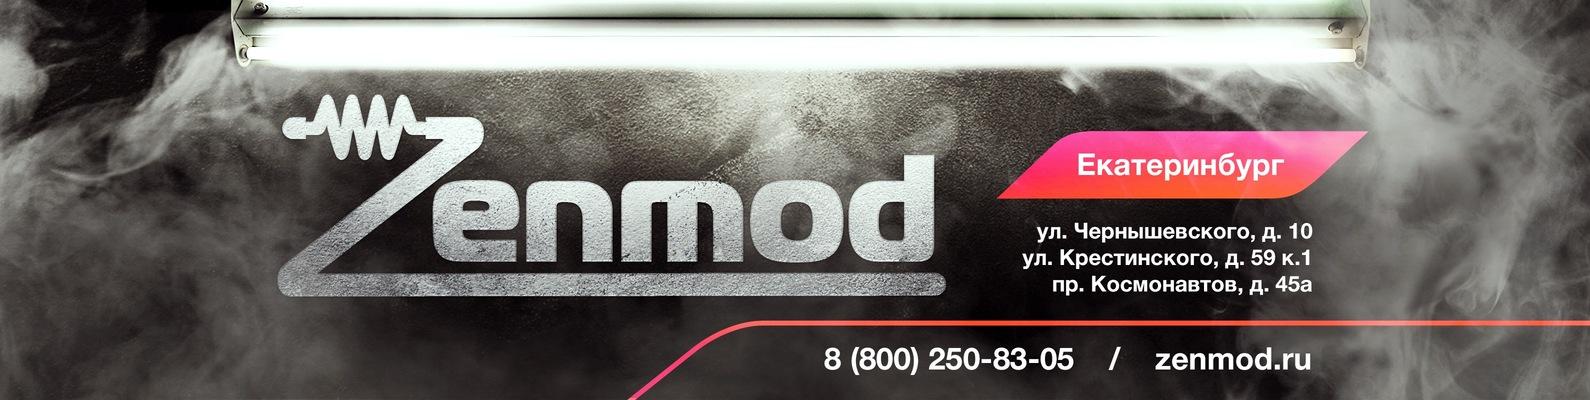 Zenmod Vape Shop   ВКонтакте 9172f8daa72